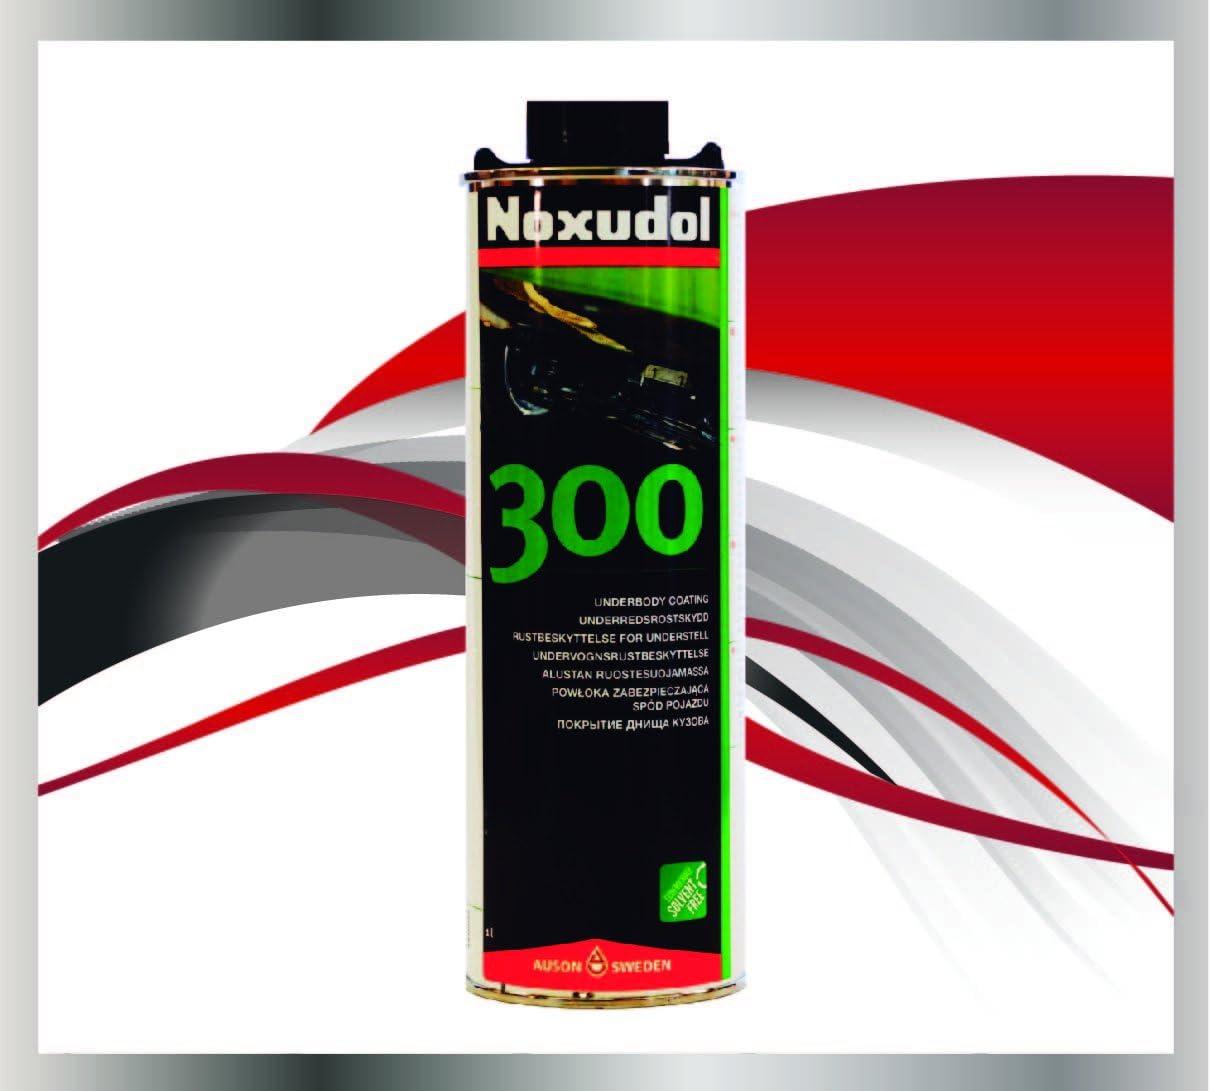 Noxudol 300 - 1 free shipping Liter Las Vegas Mall Undercoating